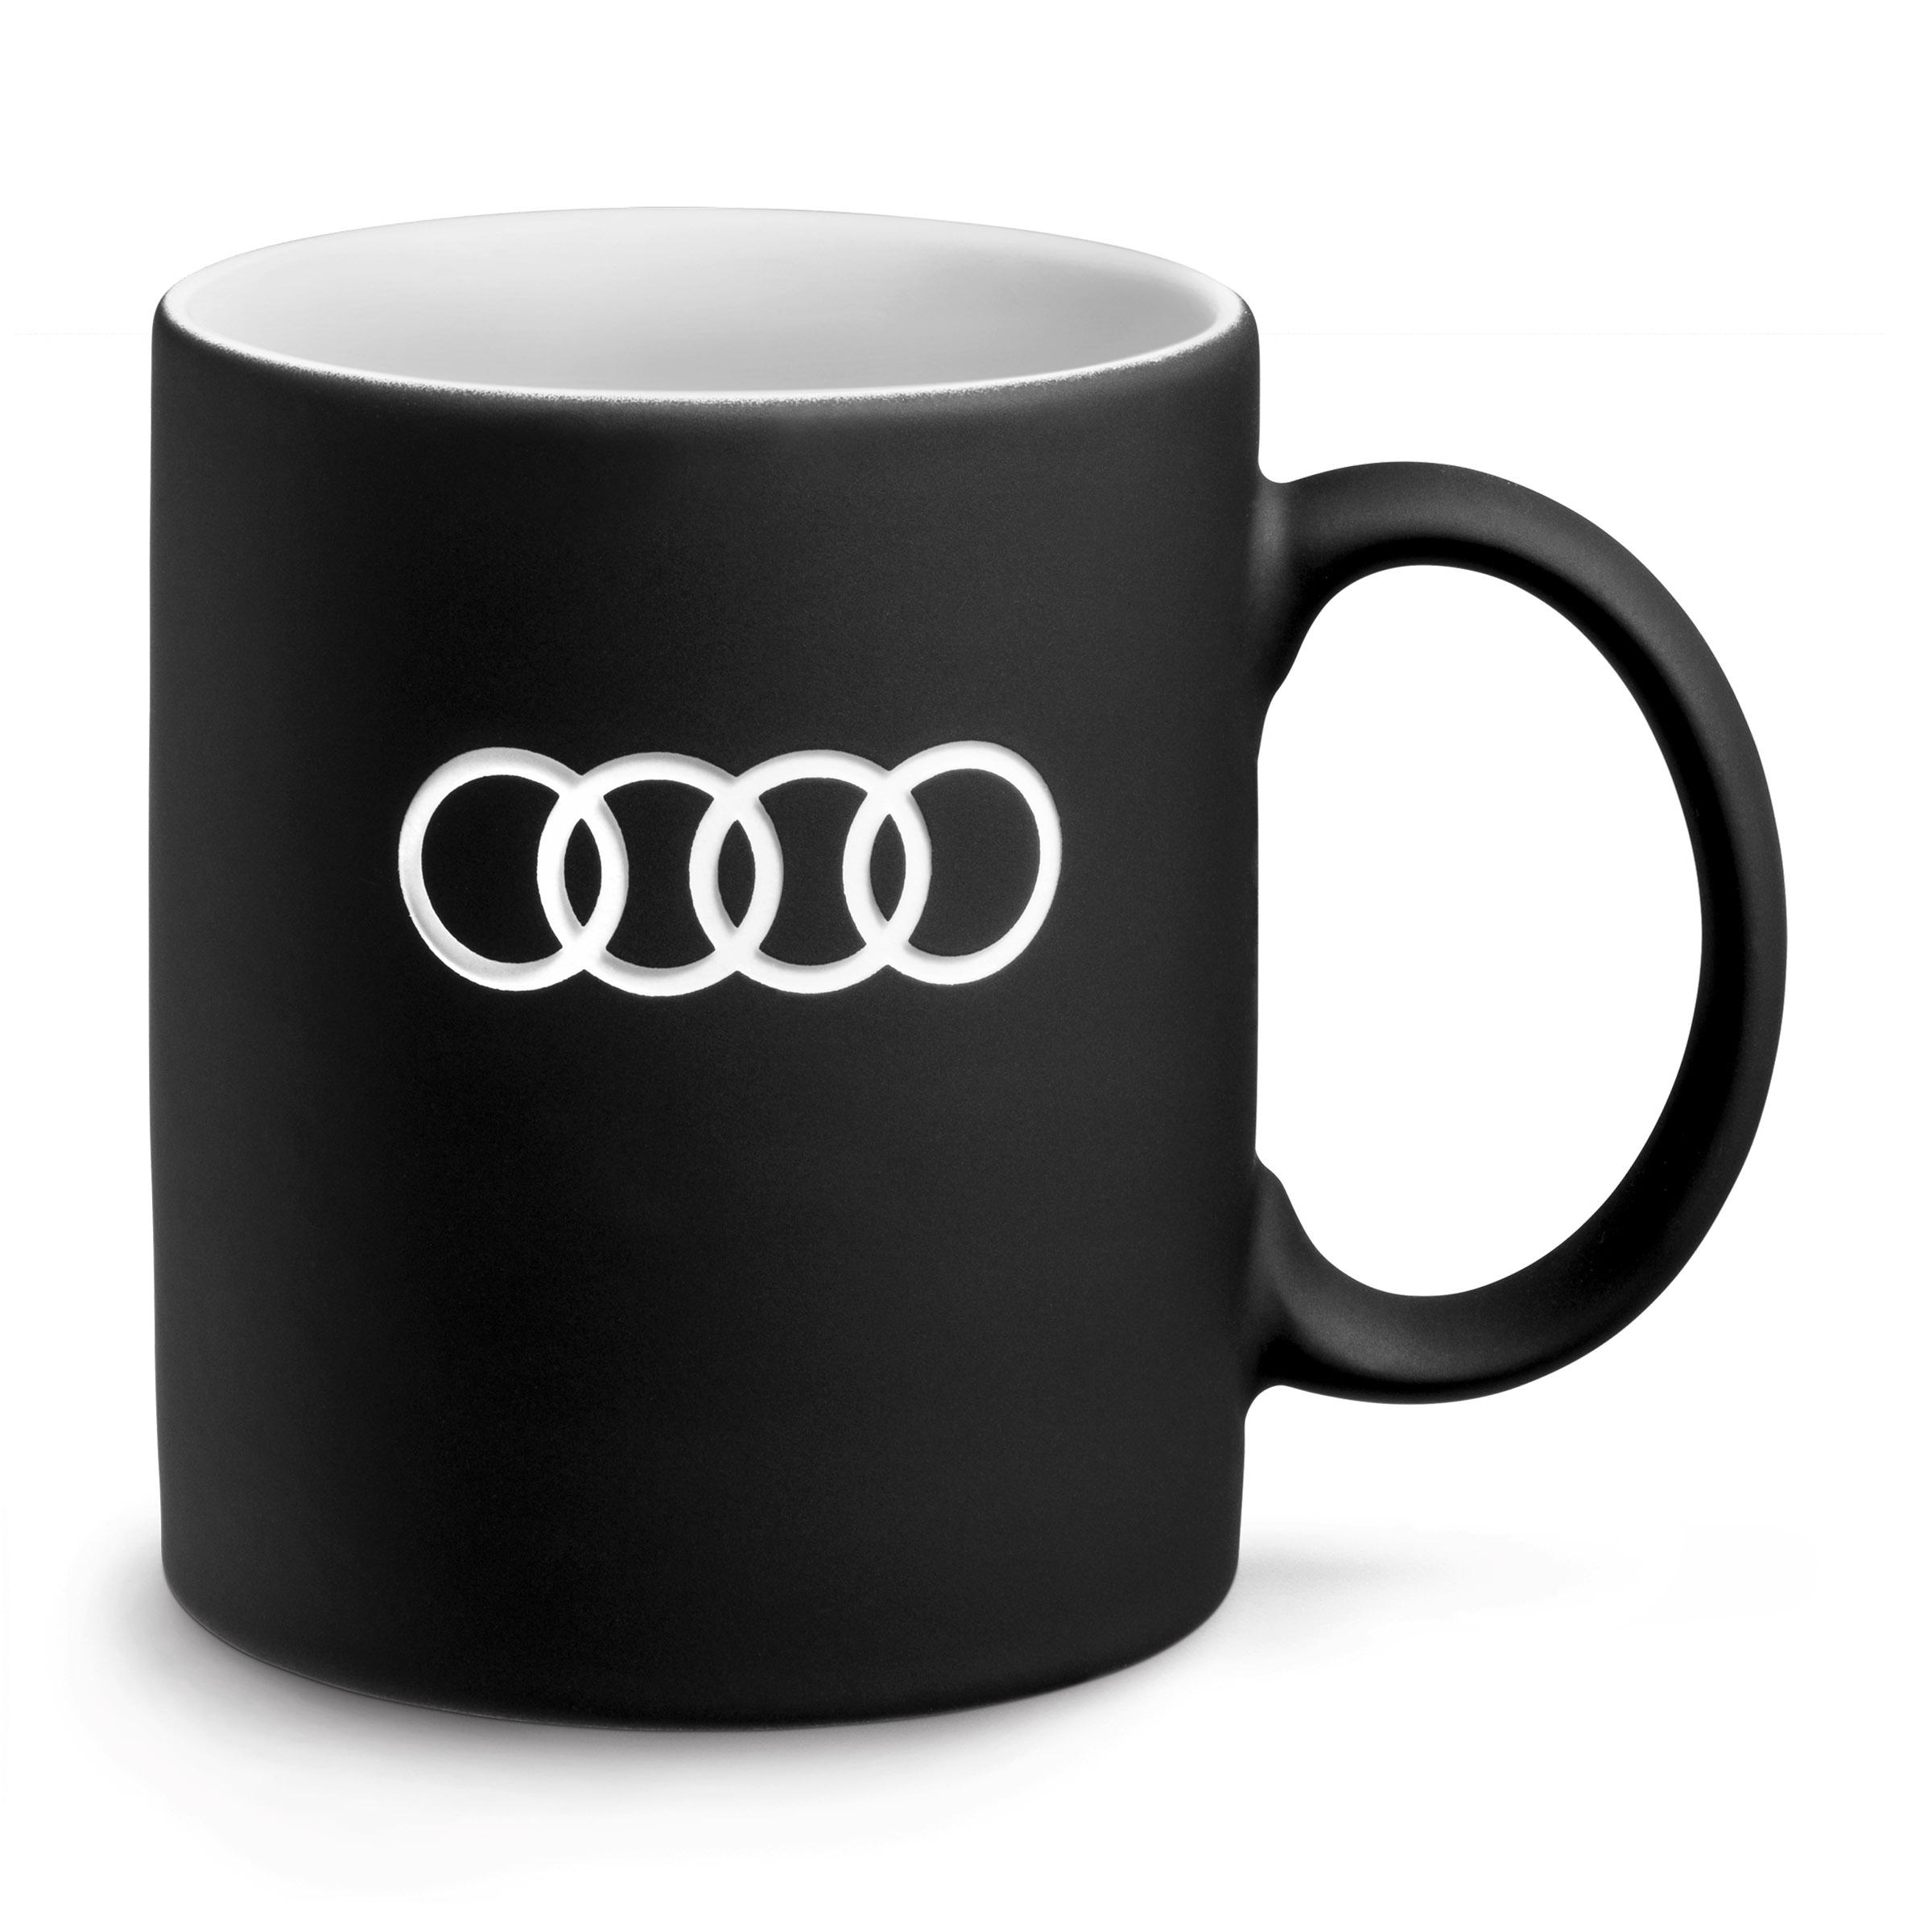 Audi Becher Ringe Kaffeebecher Teetasse Tasse schwarz